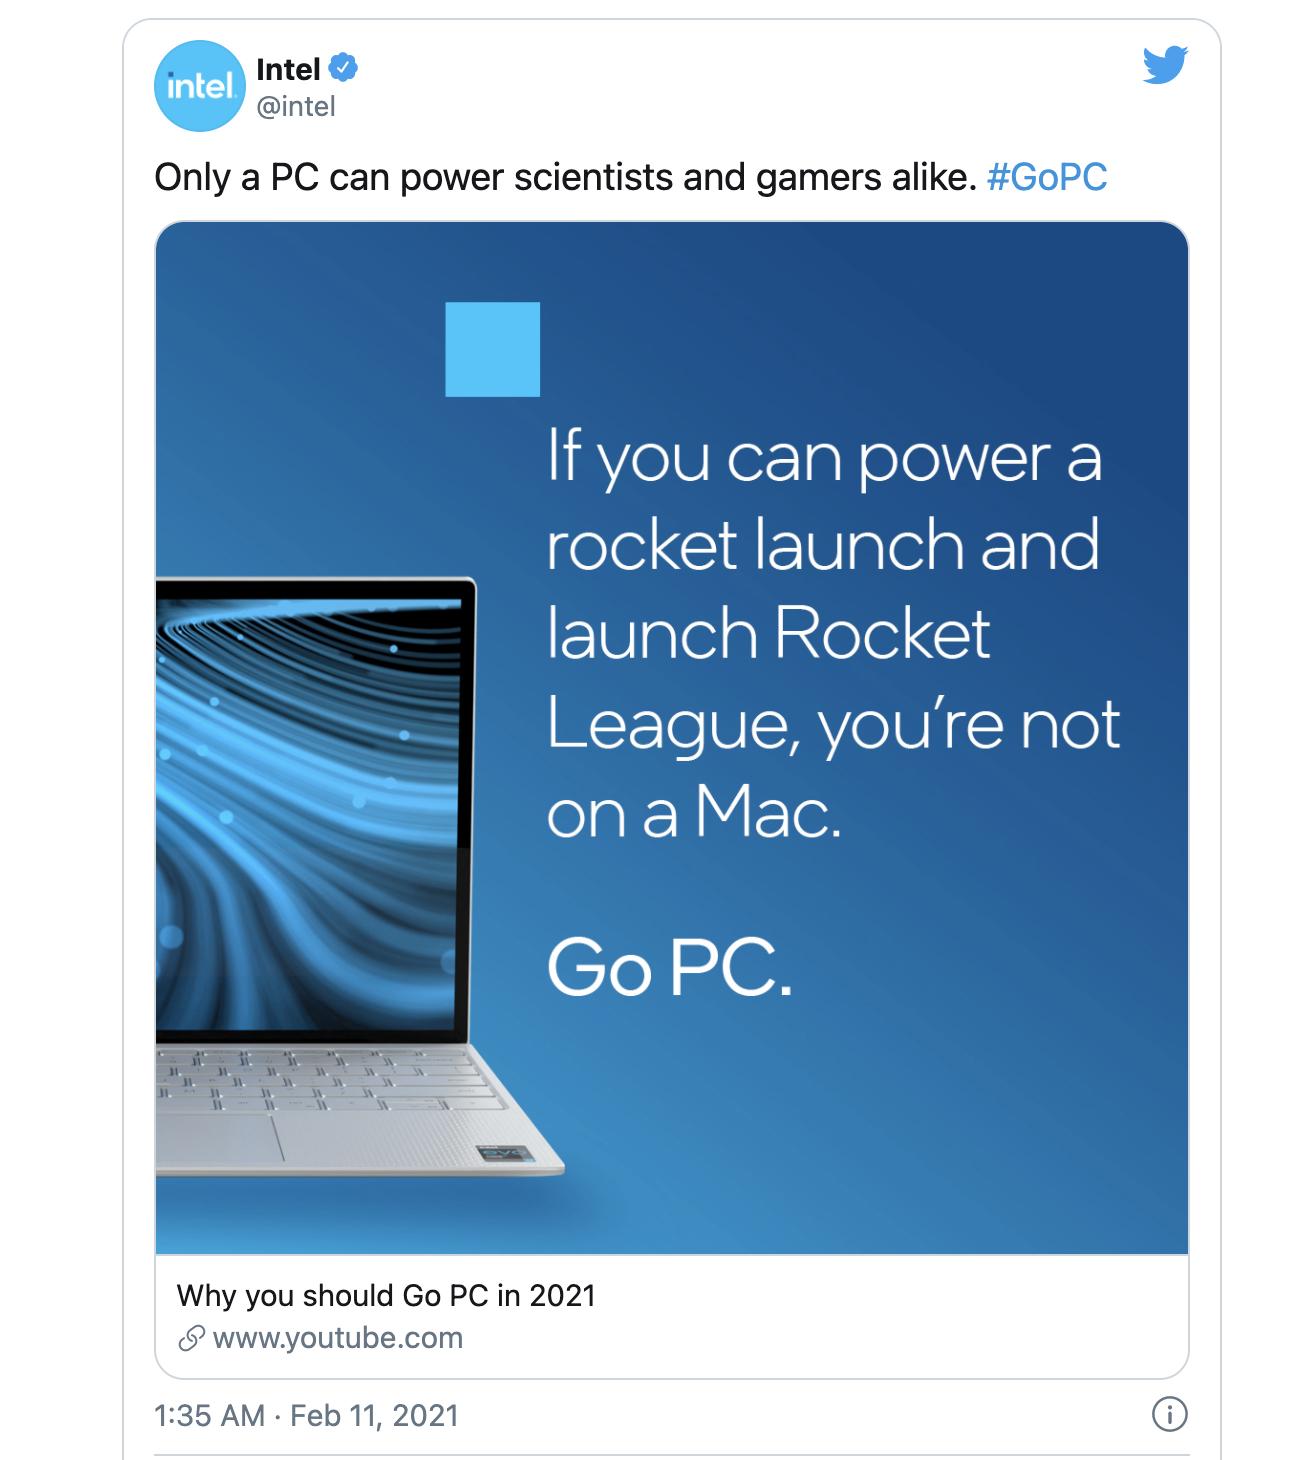 Intel多轮组合拳攻击M1 Mac:你不是Mac的目标用户!的照片 - 2